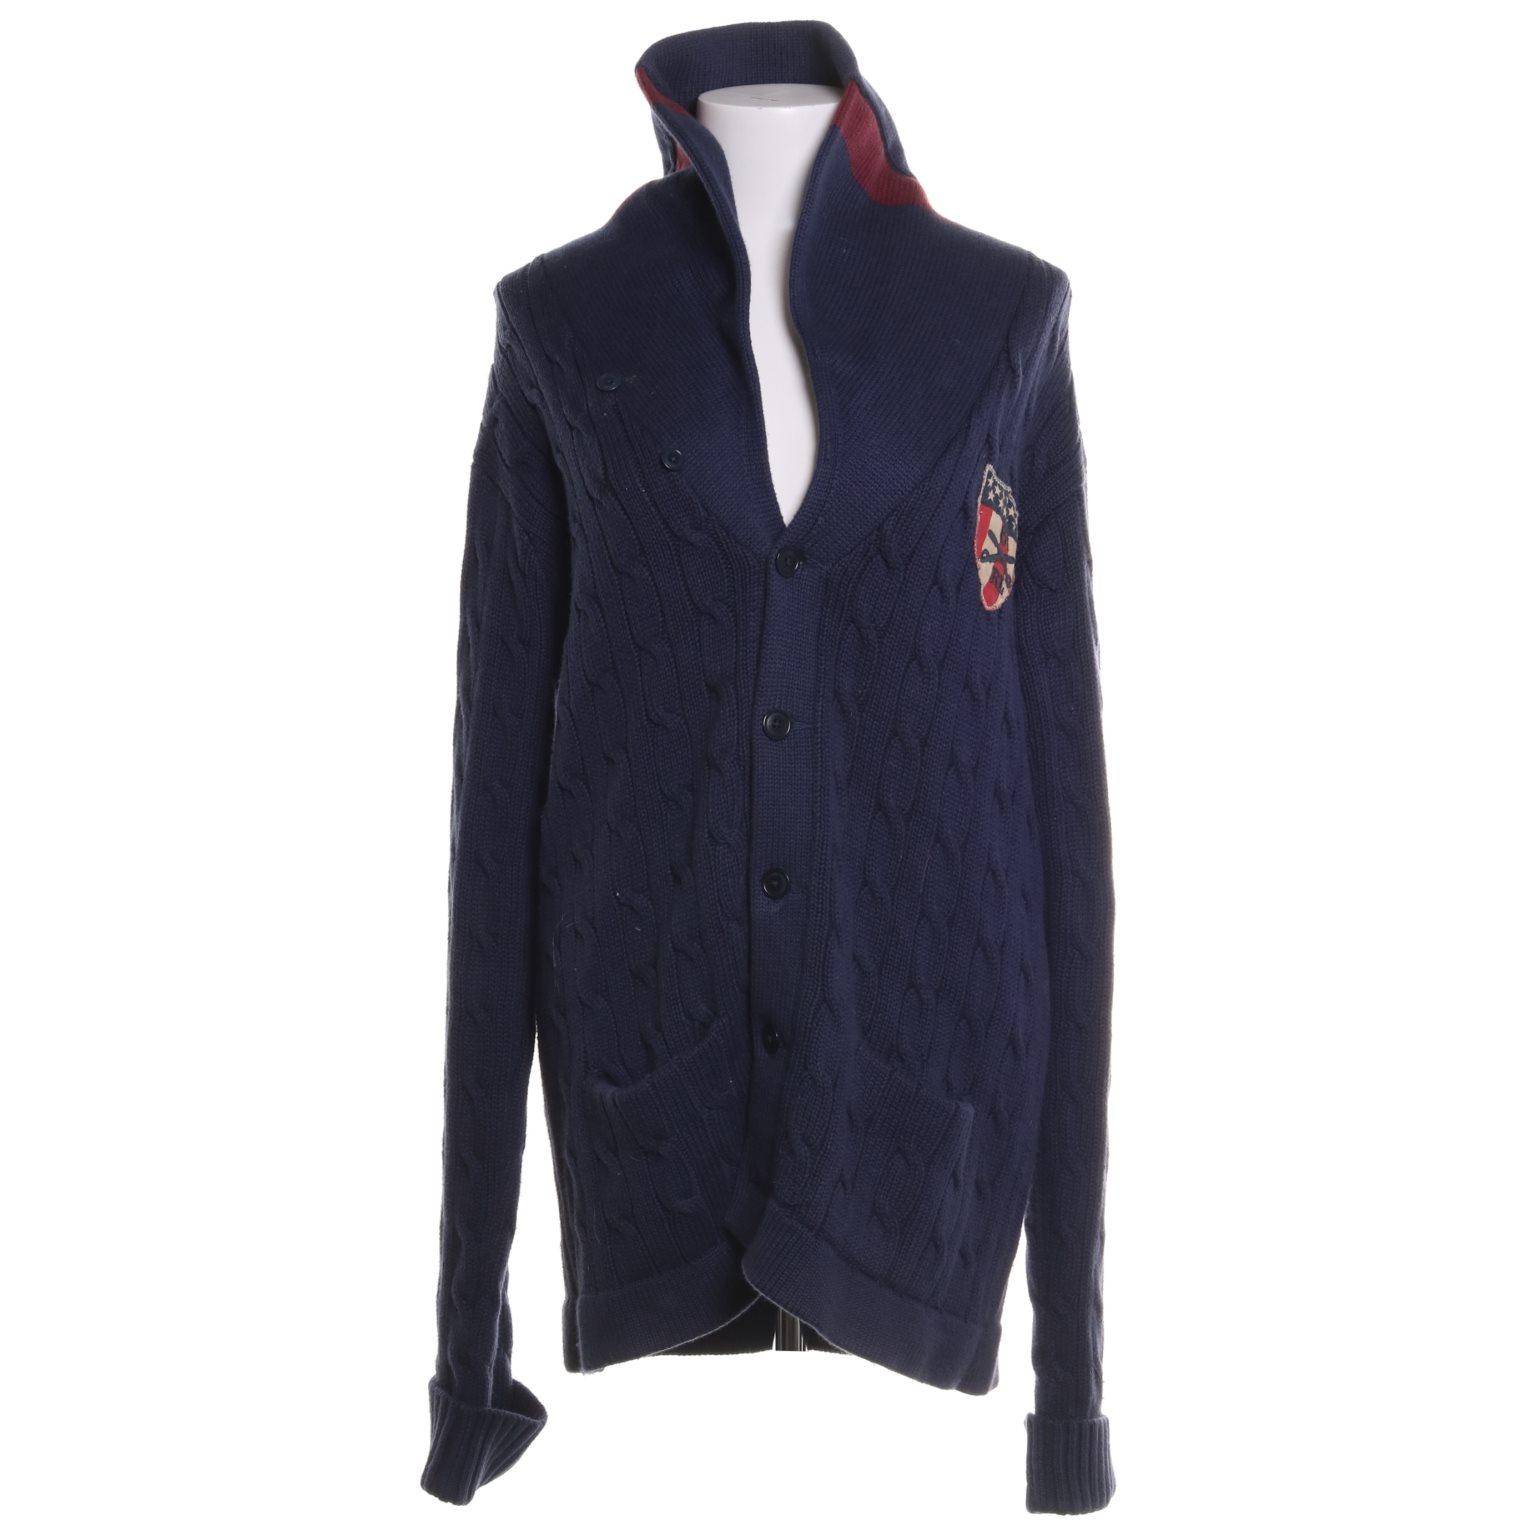 Polo Jeans Company Ralph Lauren, Kofta, Strl: L, Mörkblå